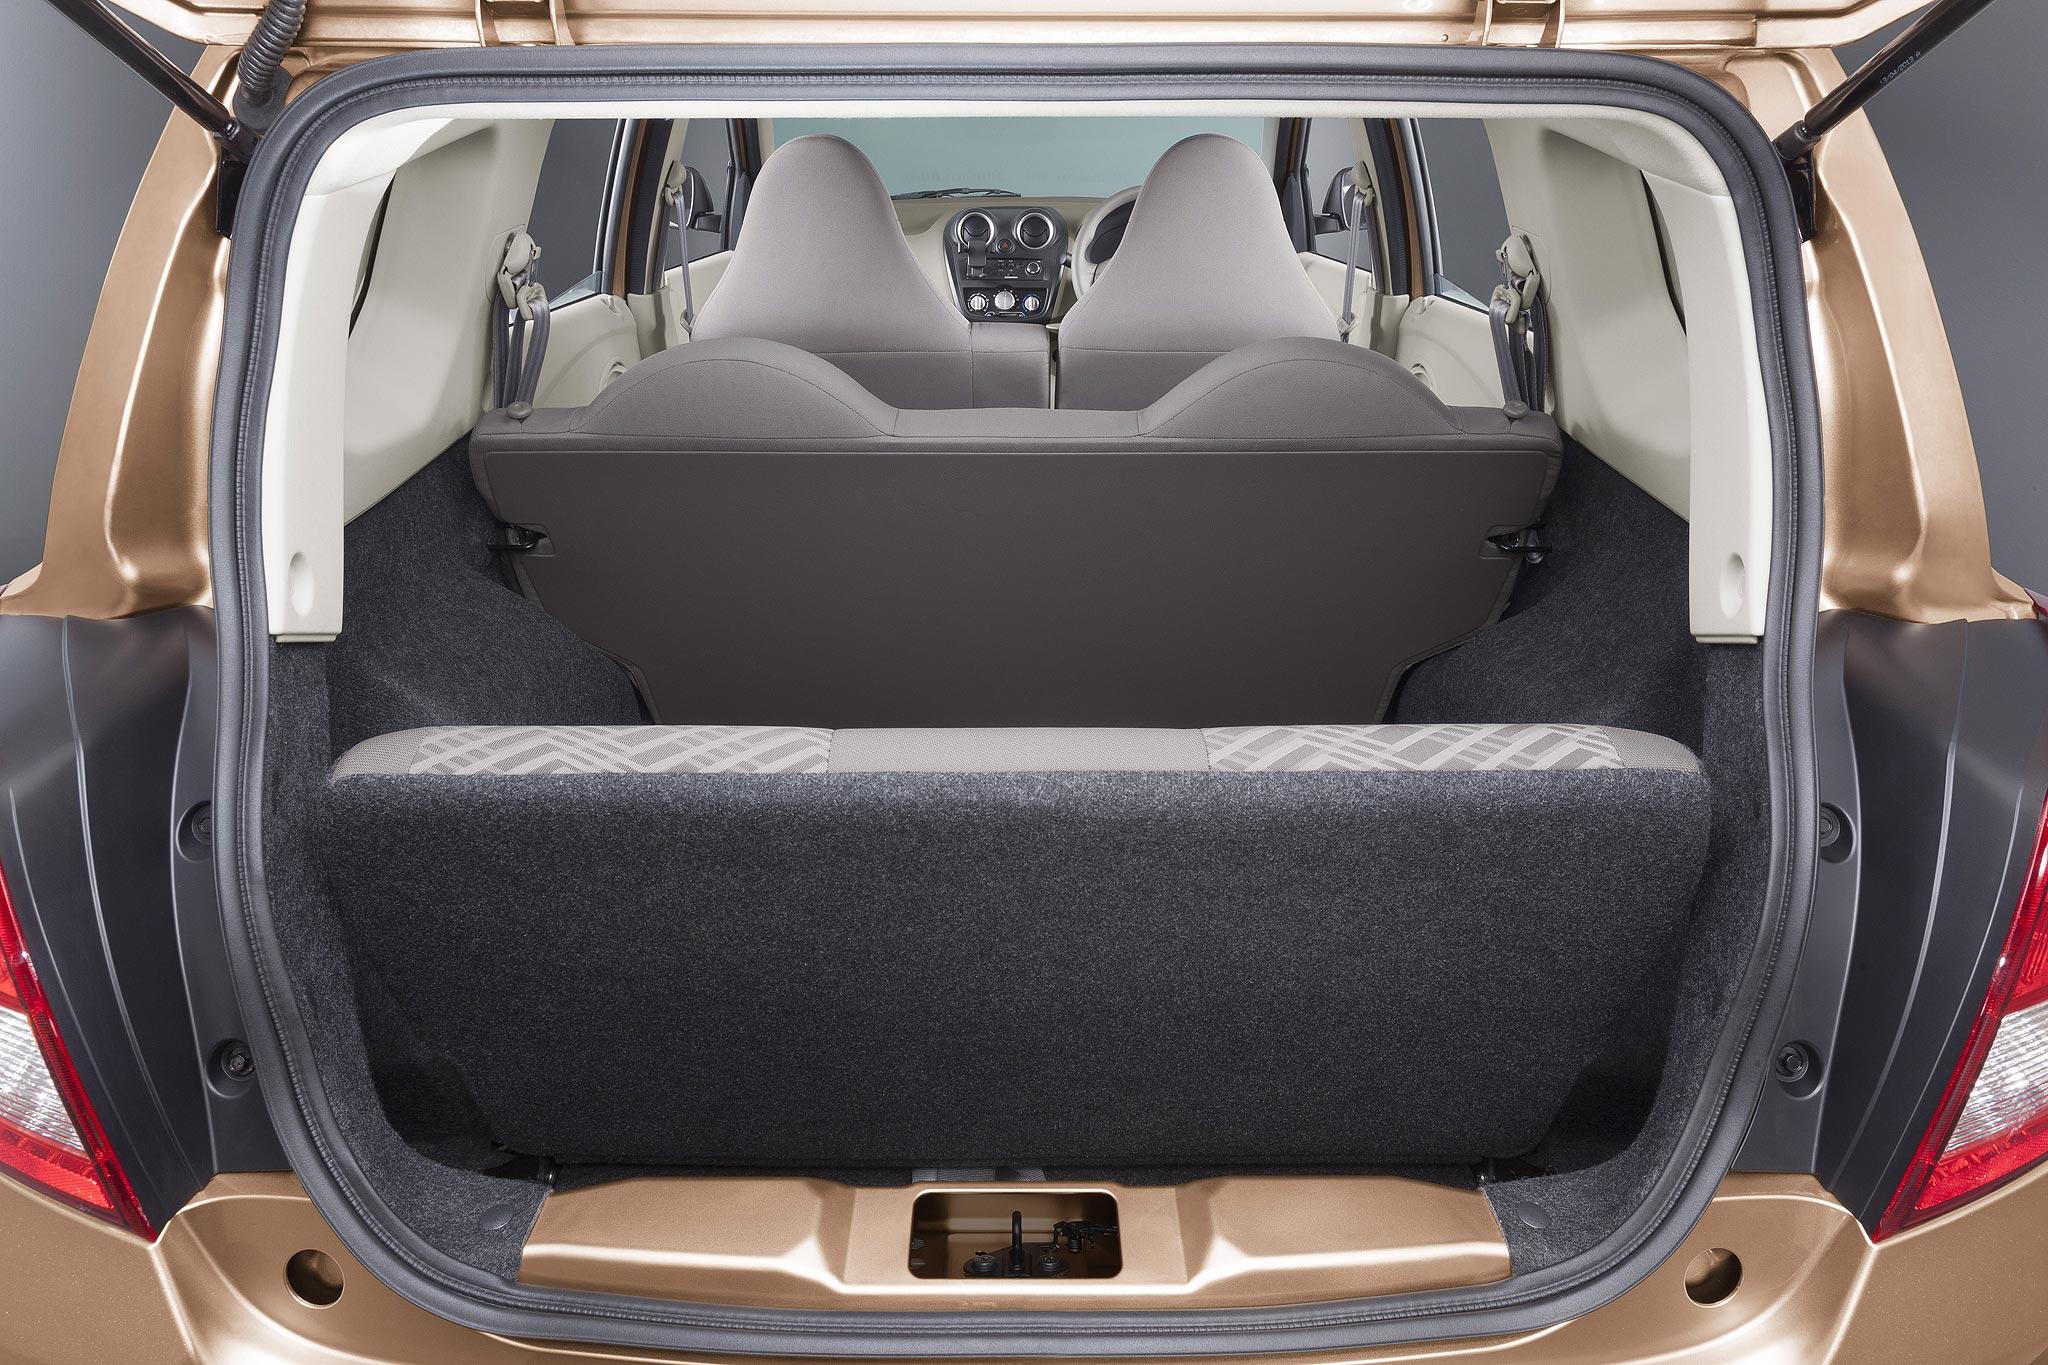 Datsun, Datsun GO Plus MPV 7 seat: Nih Gambar Datsun GO Plus High-Resolution